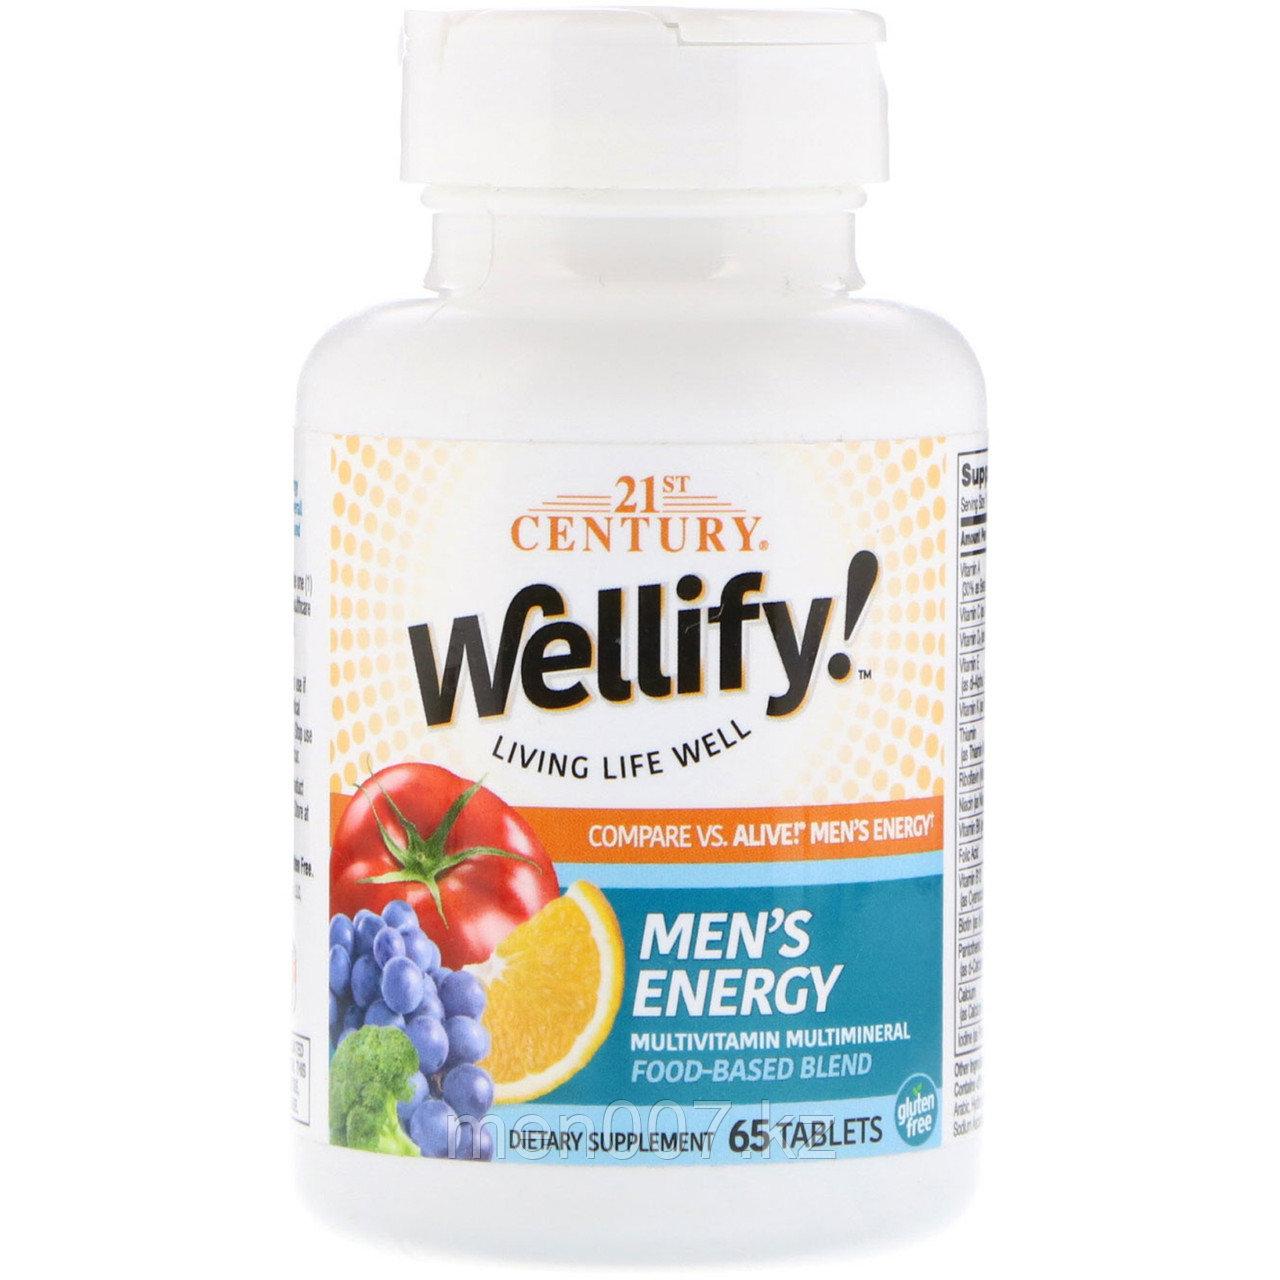 БАД Мультивитамины для мужчин Wellify! от 21 century США (65 таблеток)